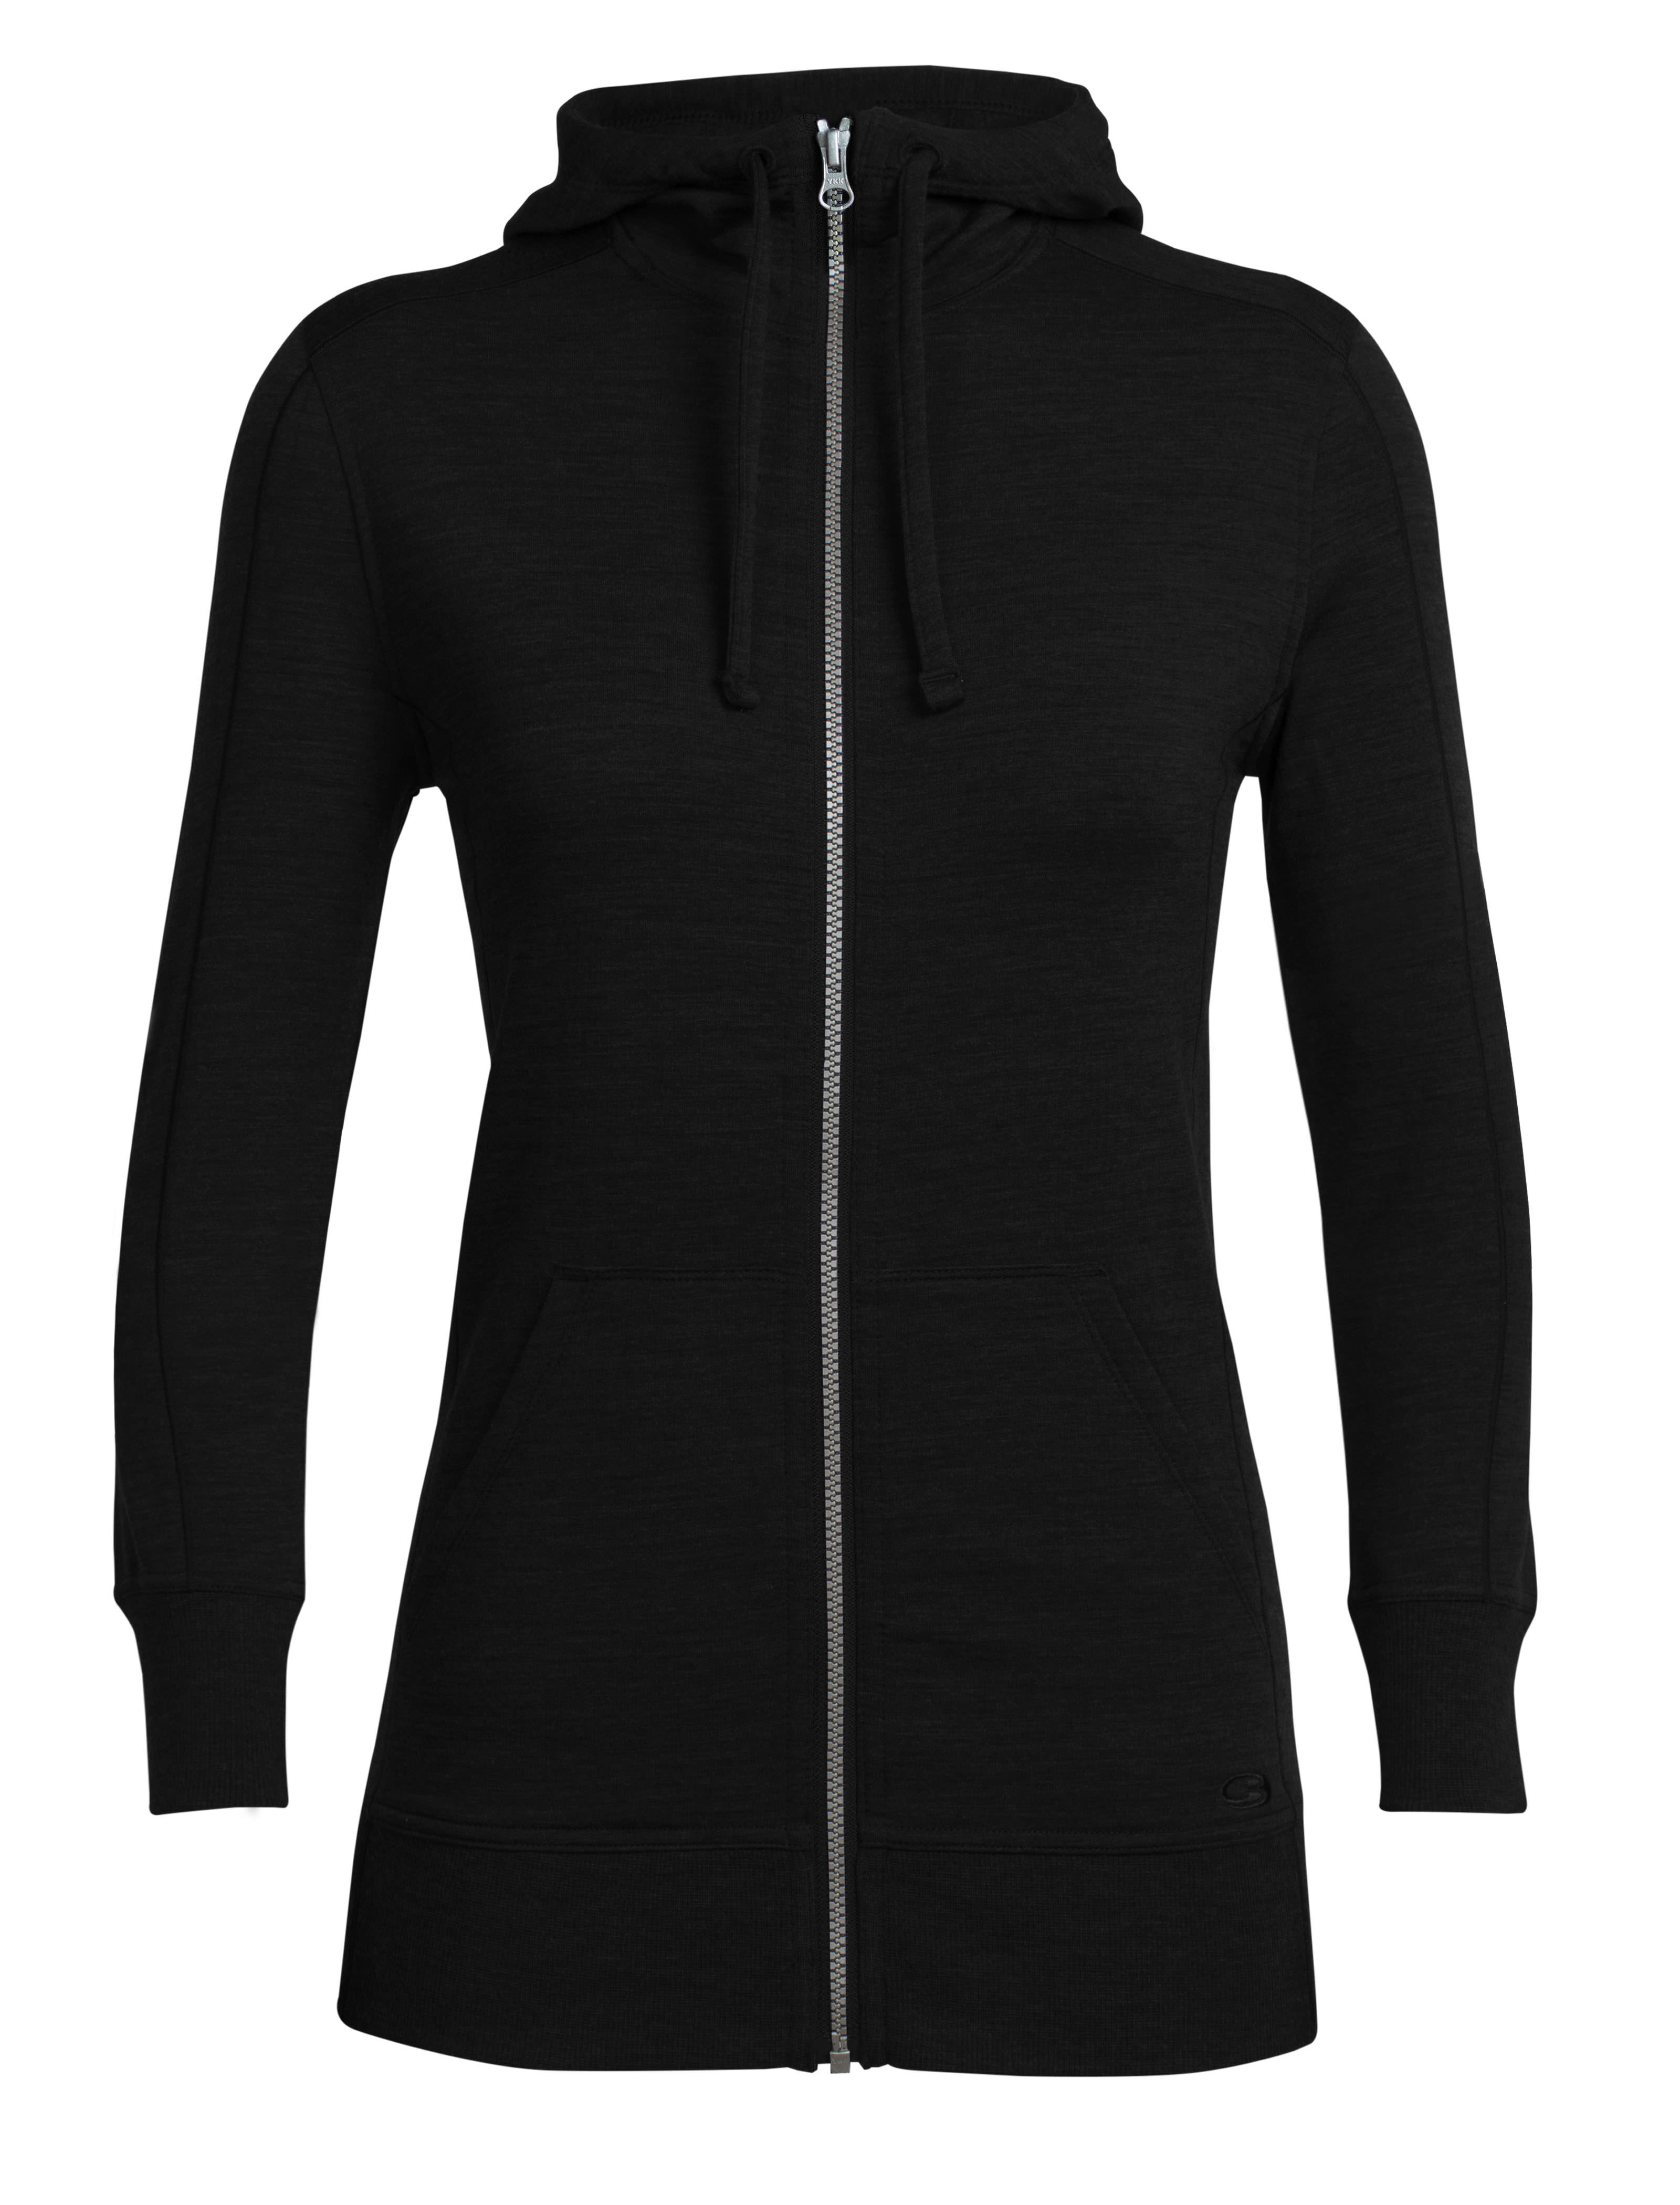 Kleidung & Accessoires Practical Pullover Damen Damenmode